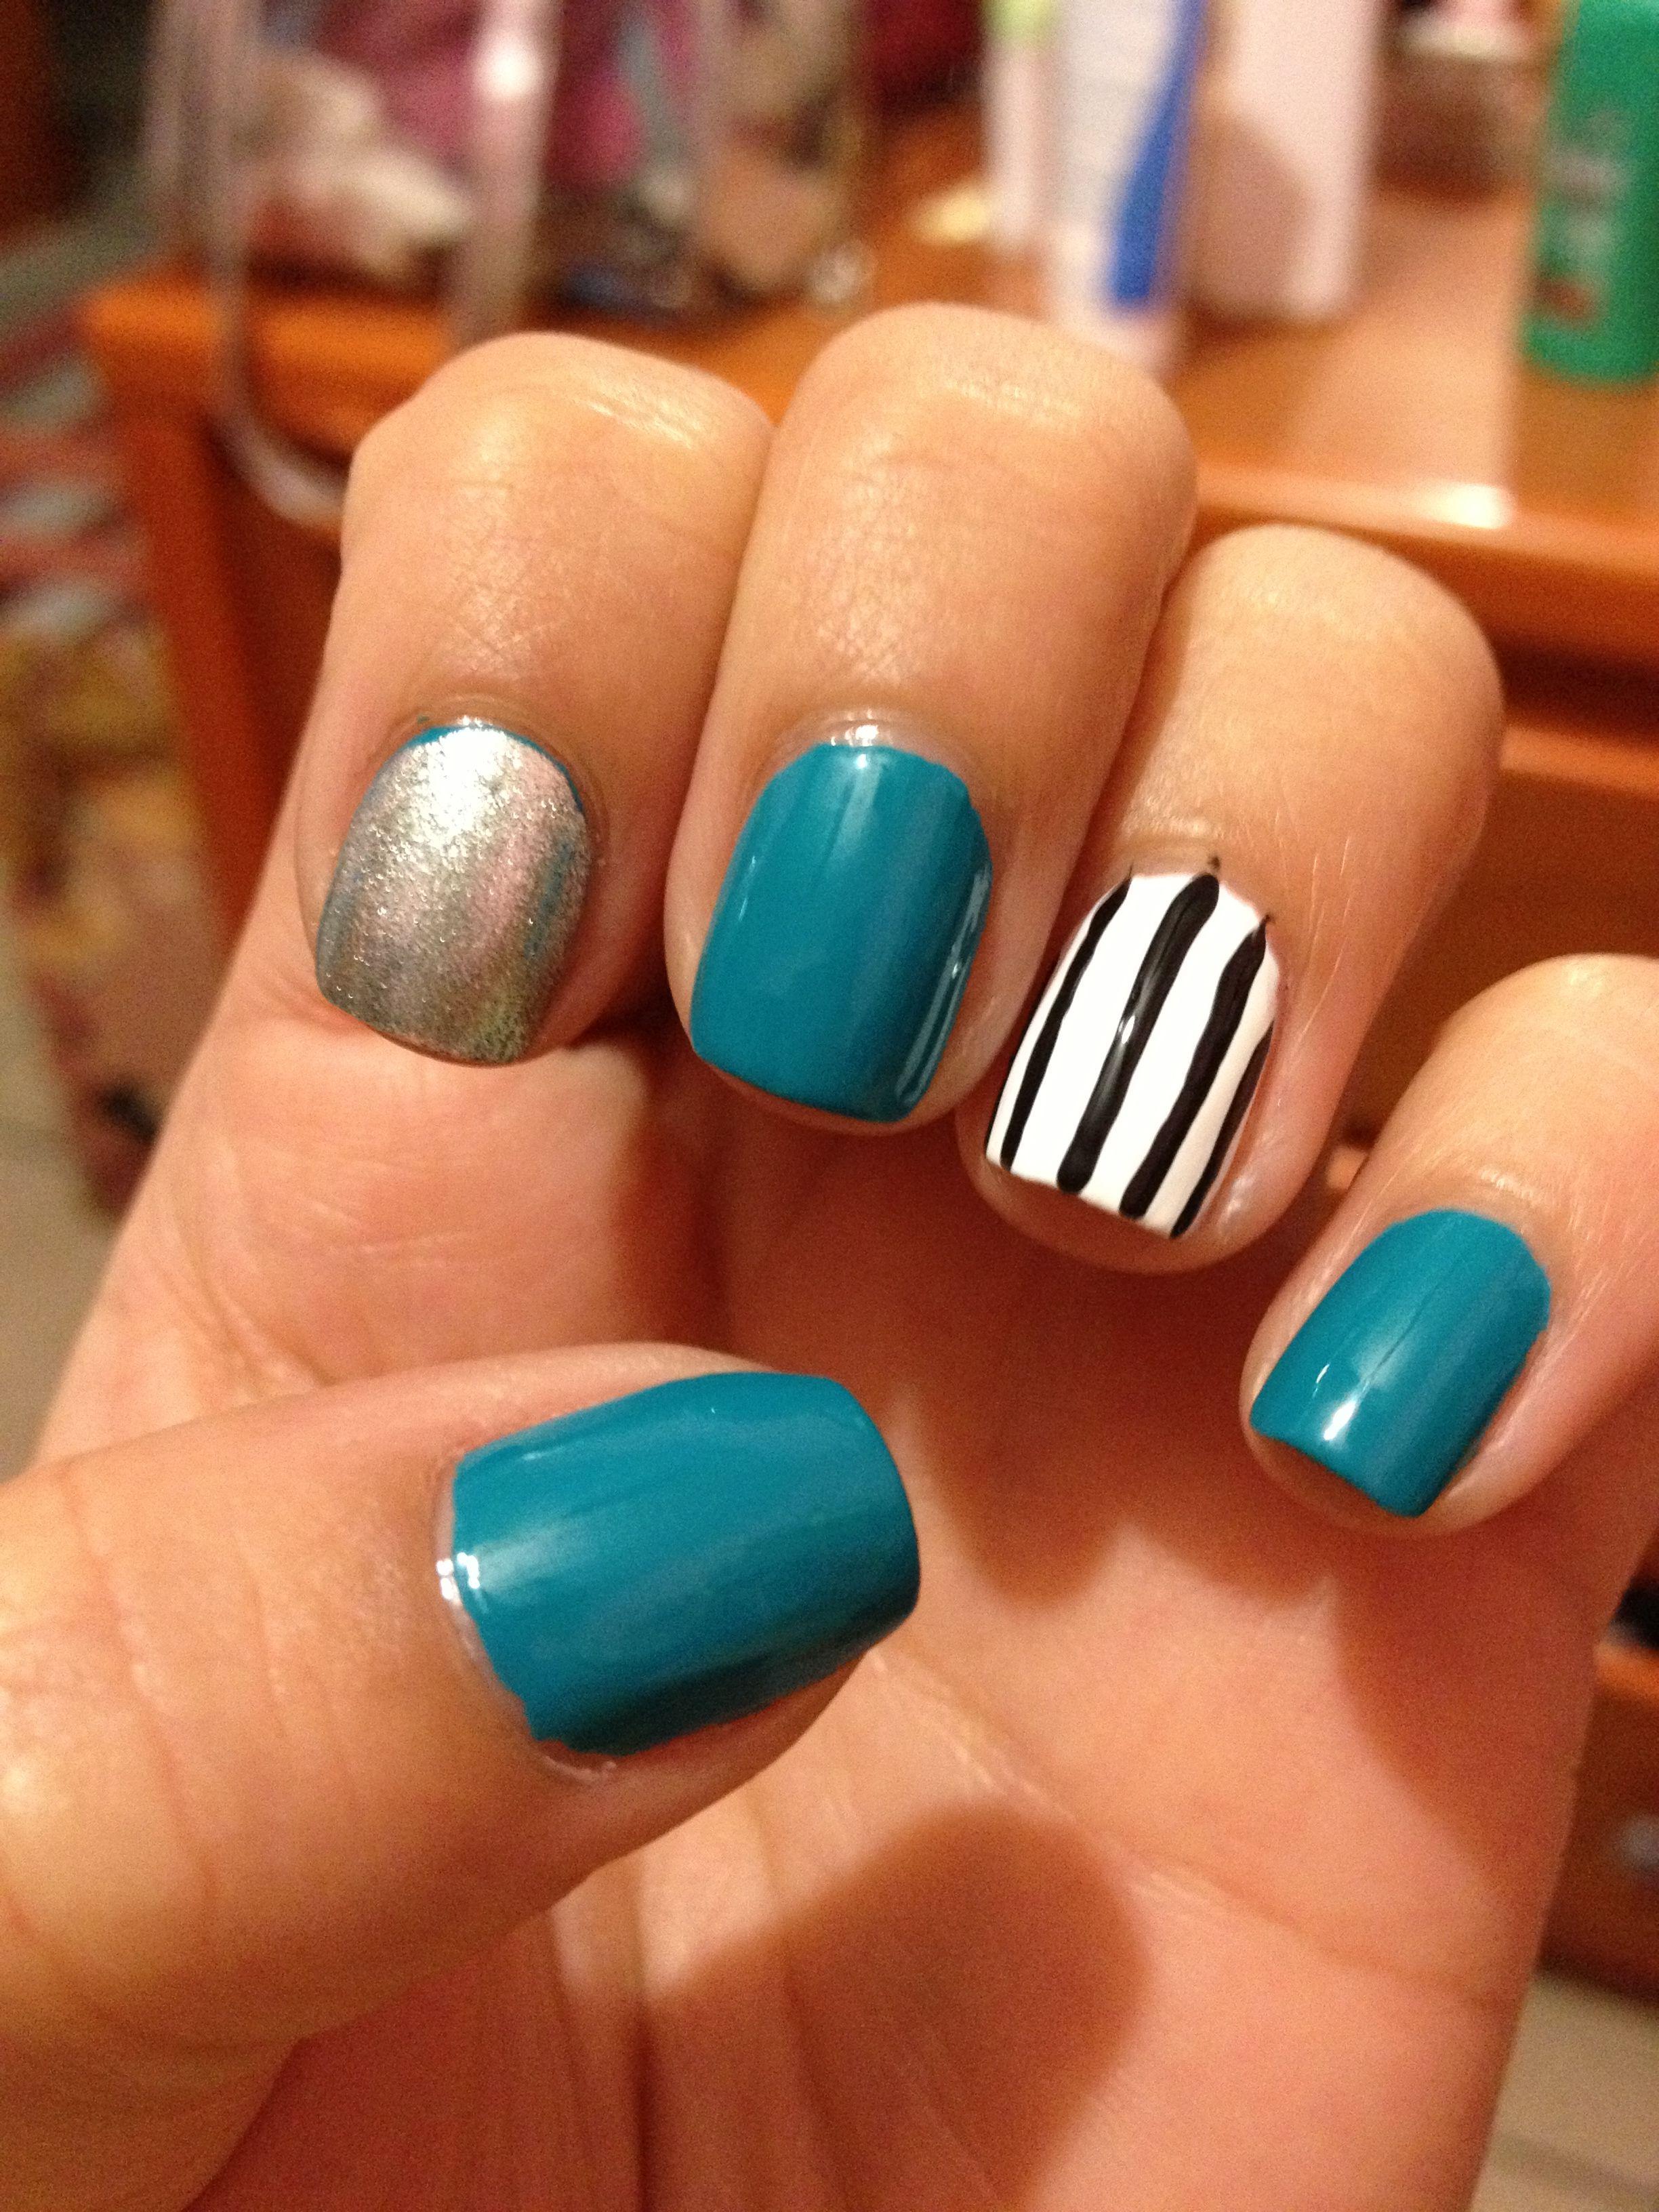 white blue | Nail art designs, Nail designs, Nail art